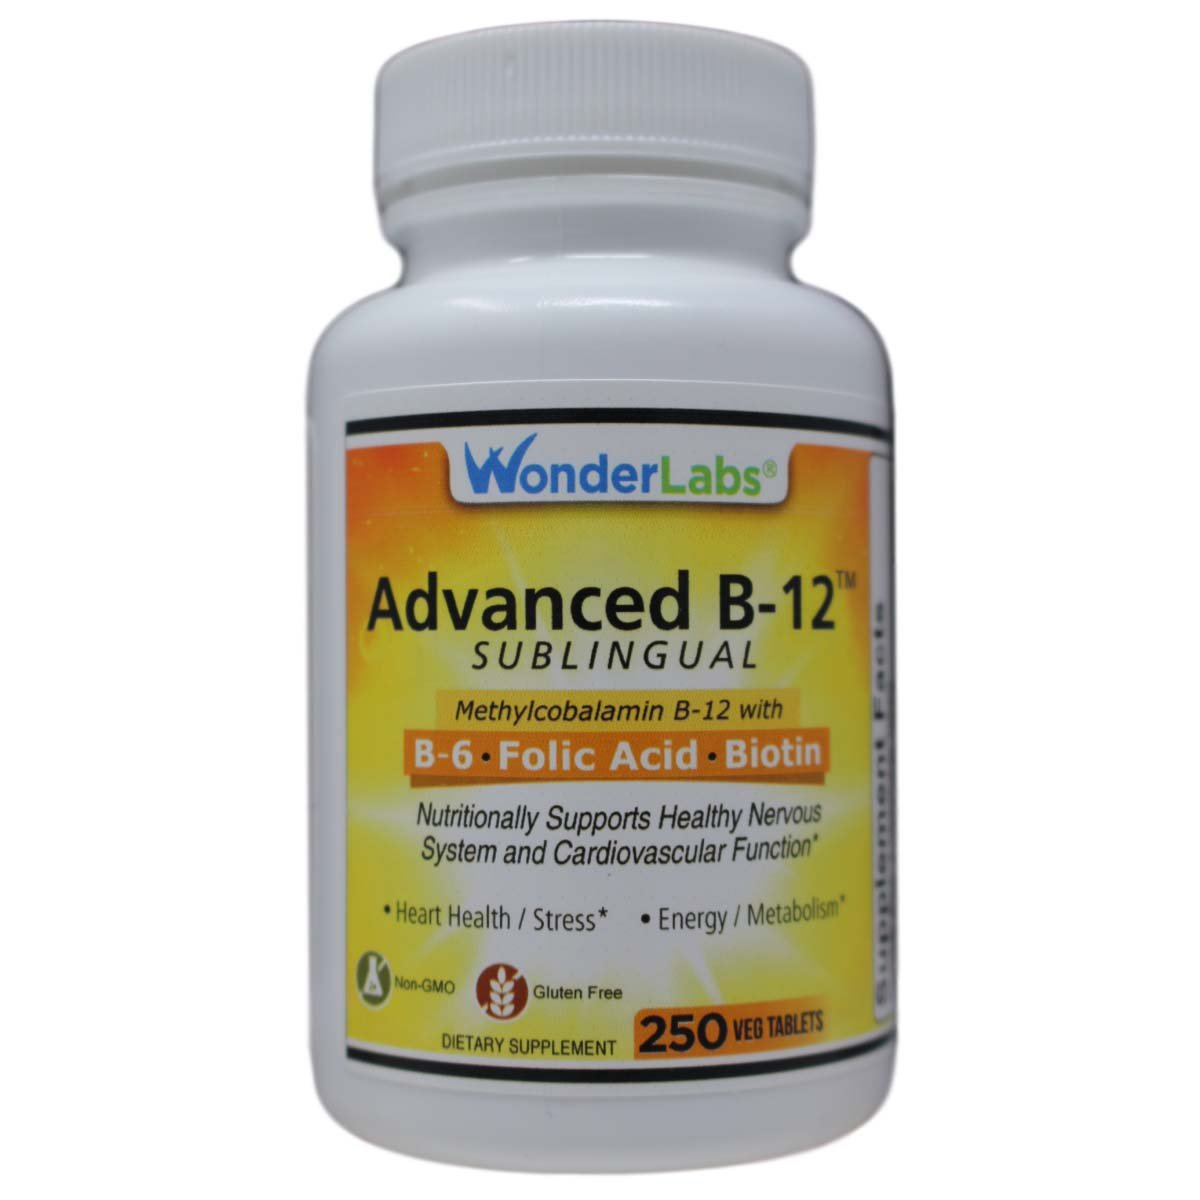 Sublingual Vitamin B12 1000 Mcg B6 5mg Folic Acid 400 Mcg Biotin 25mcg Formulated With Methylcobalamin Vitamin B 12 250 Tablets